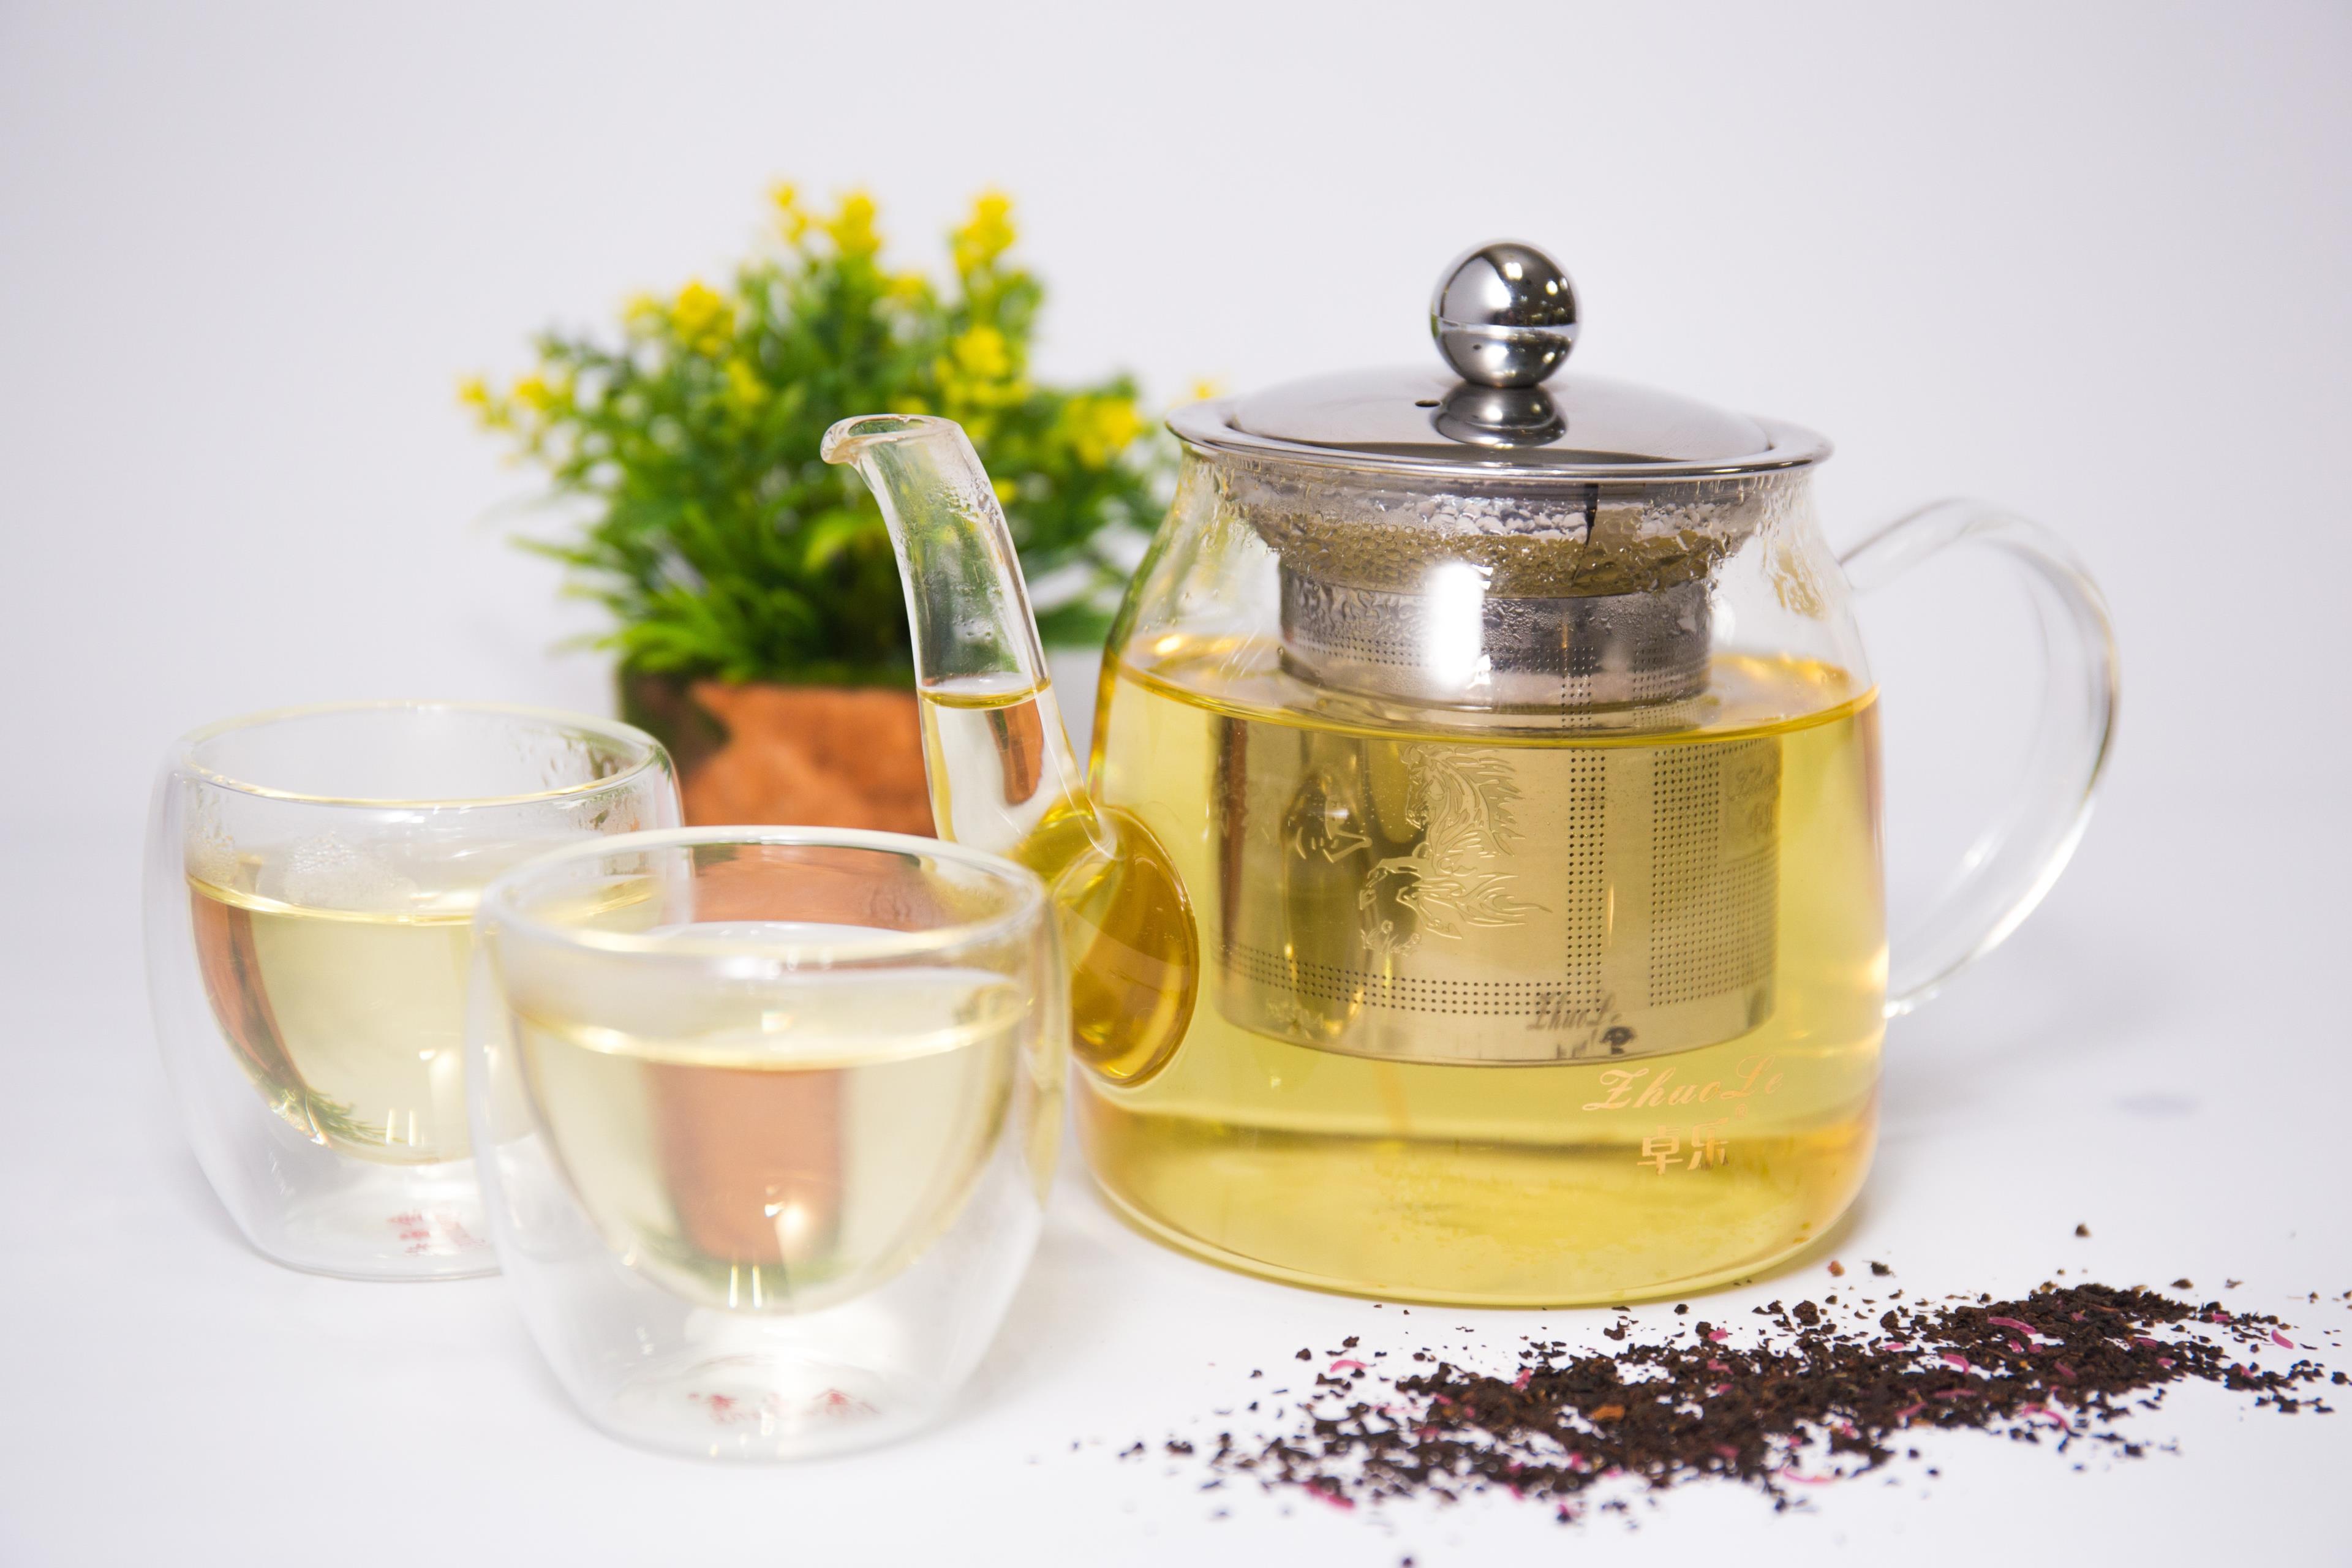 Tè bianco in tazza e caraffa